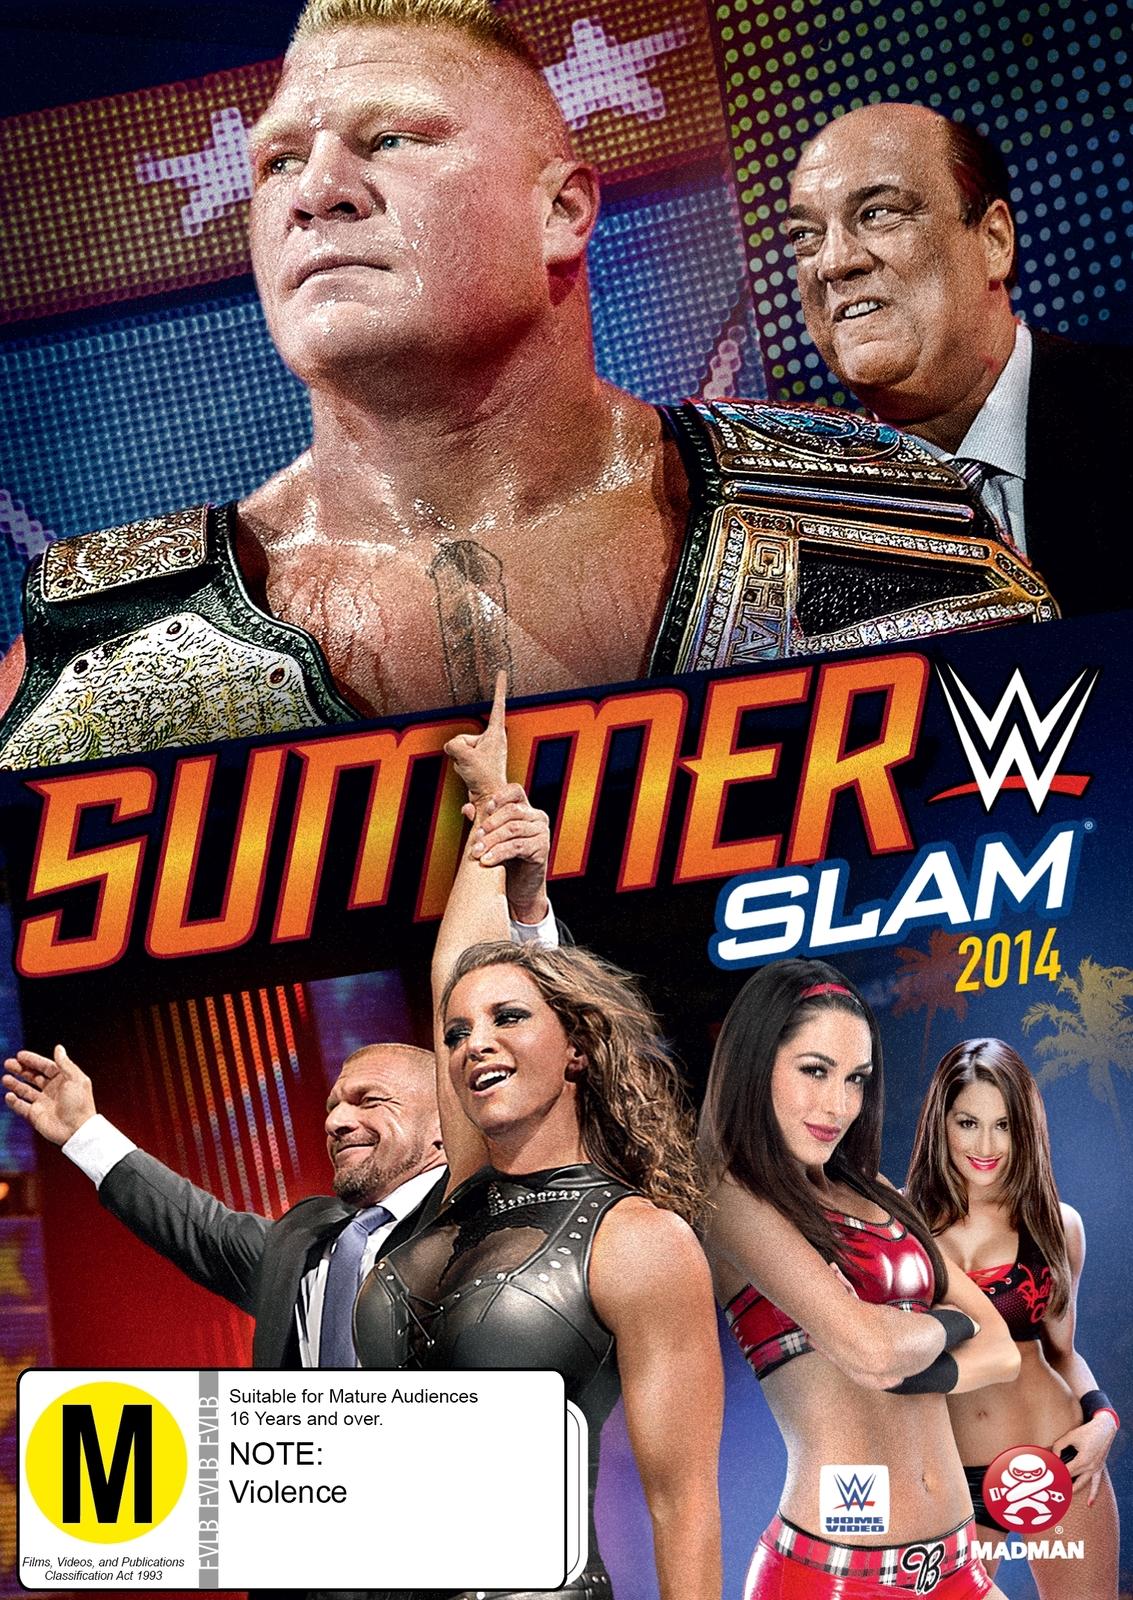 WWE Summerslam 2014 on DVD image